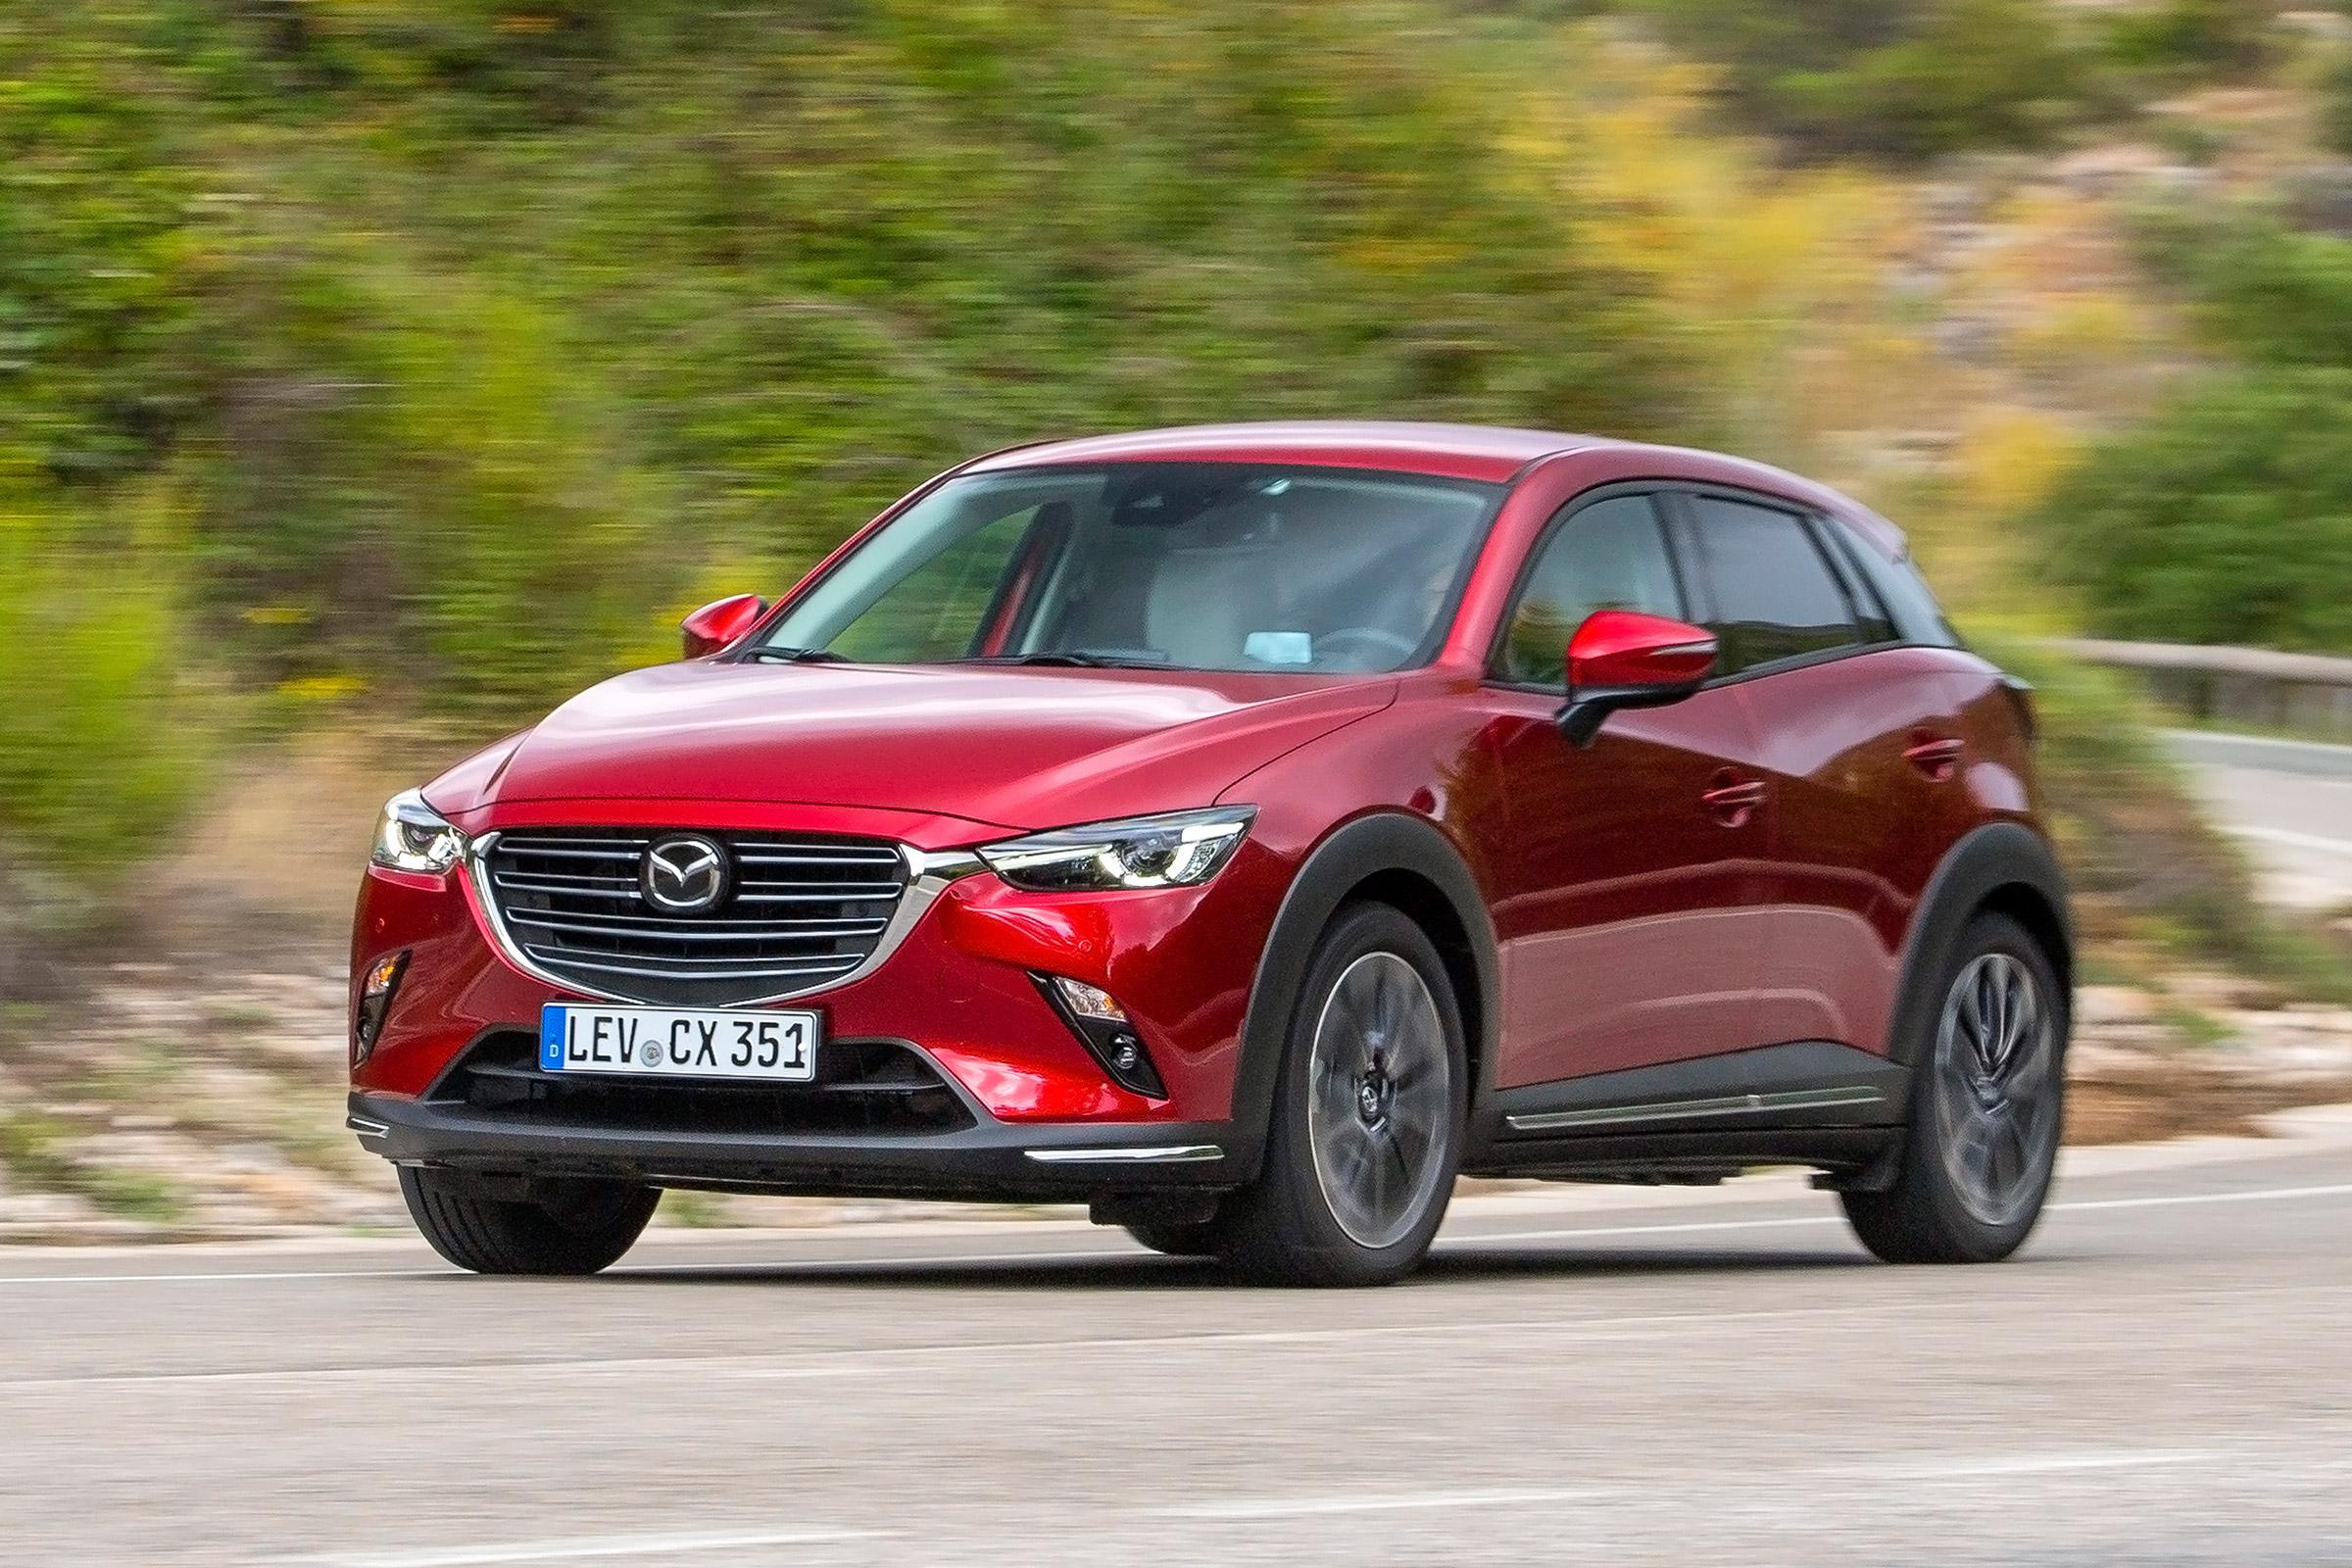 Kekurangan Mazda Cx 3 2018 Spesifikasi